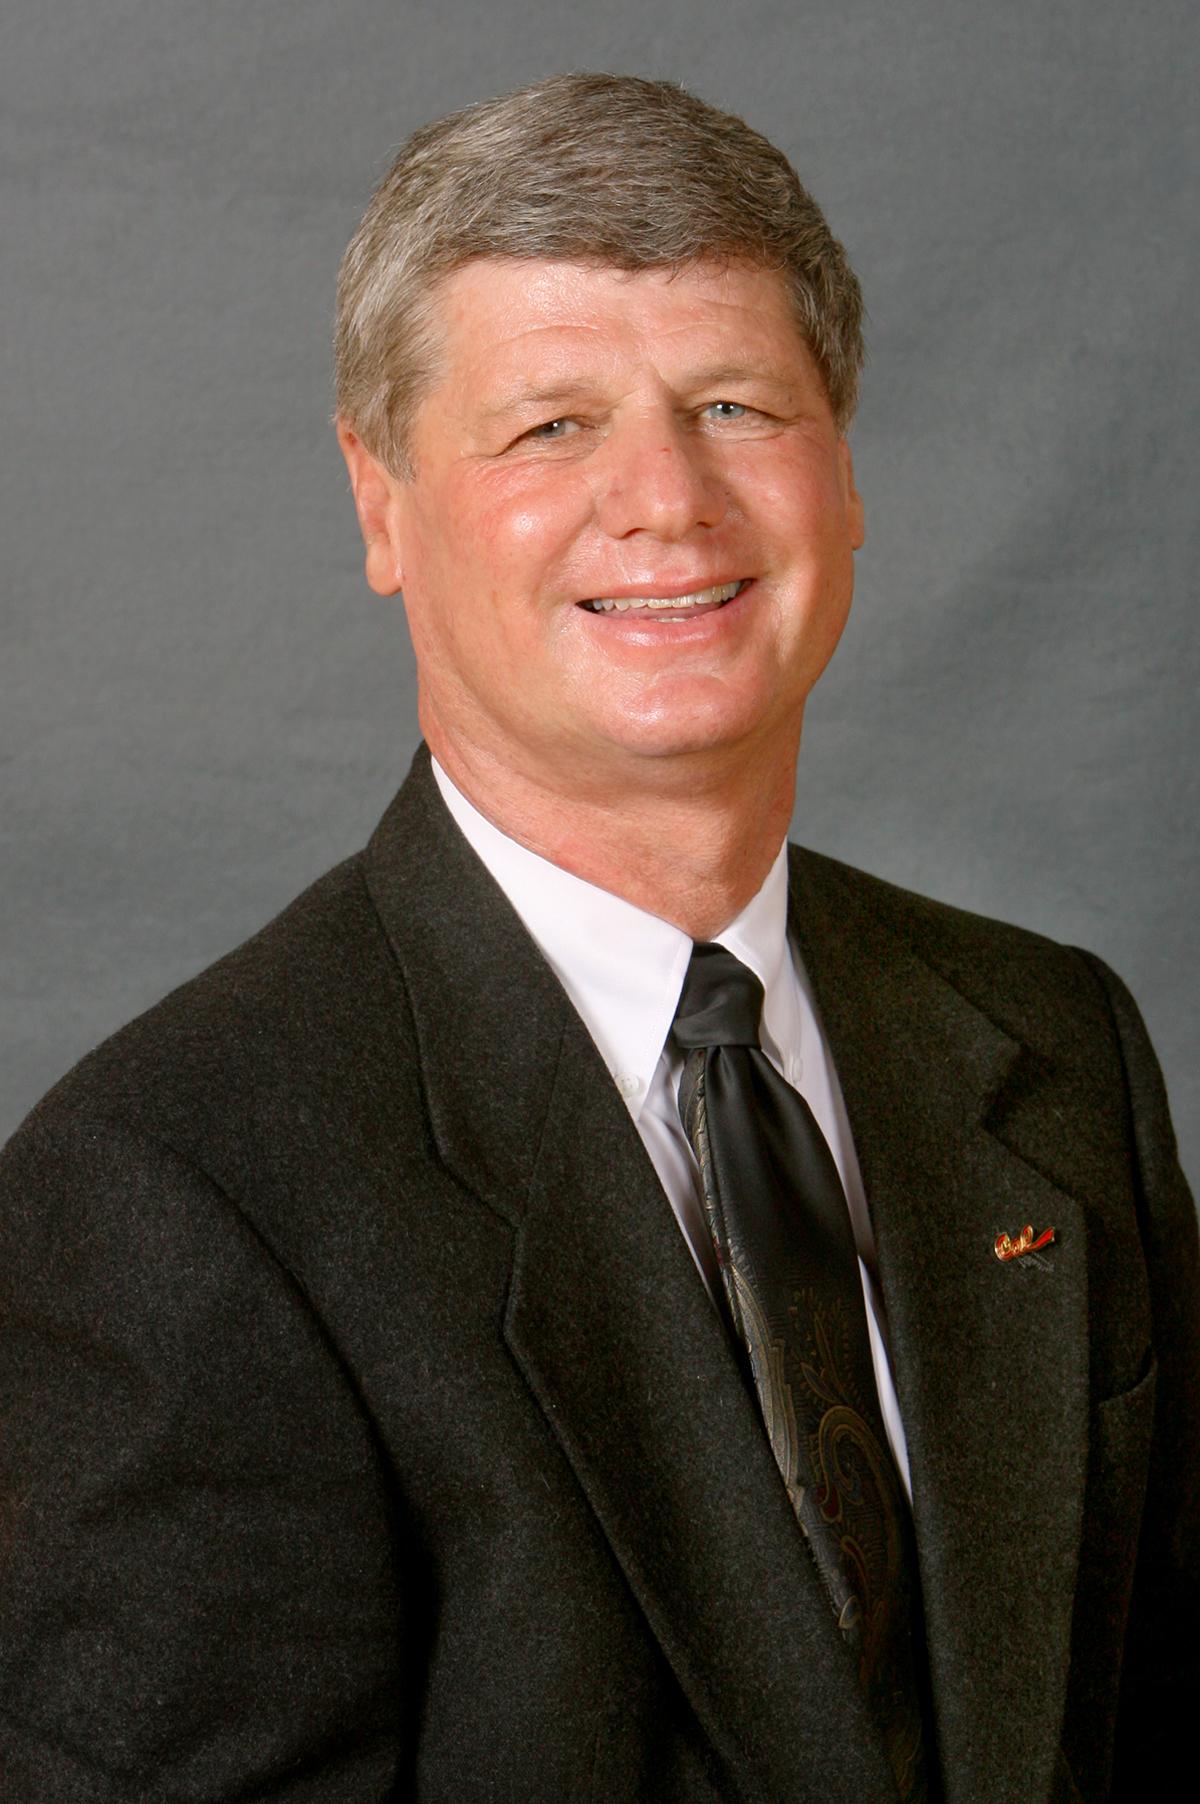 Thomas G. Pucci, PhD